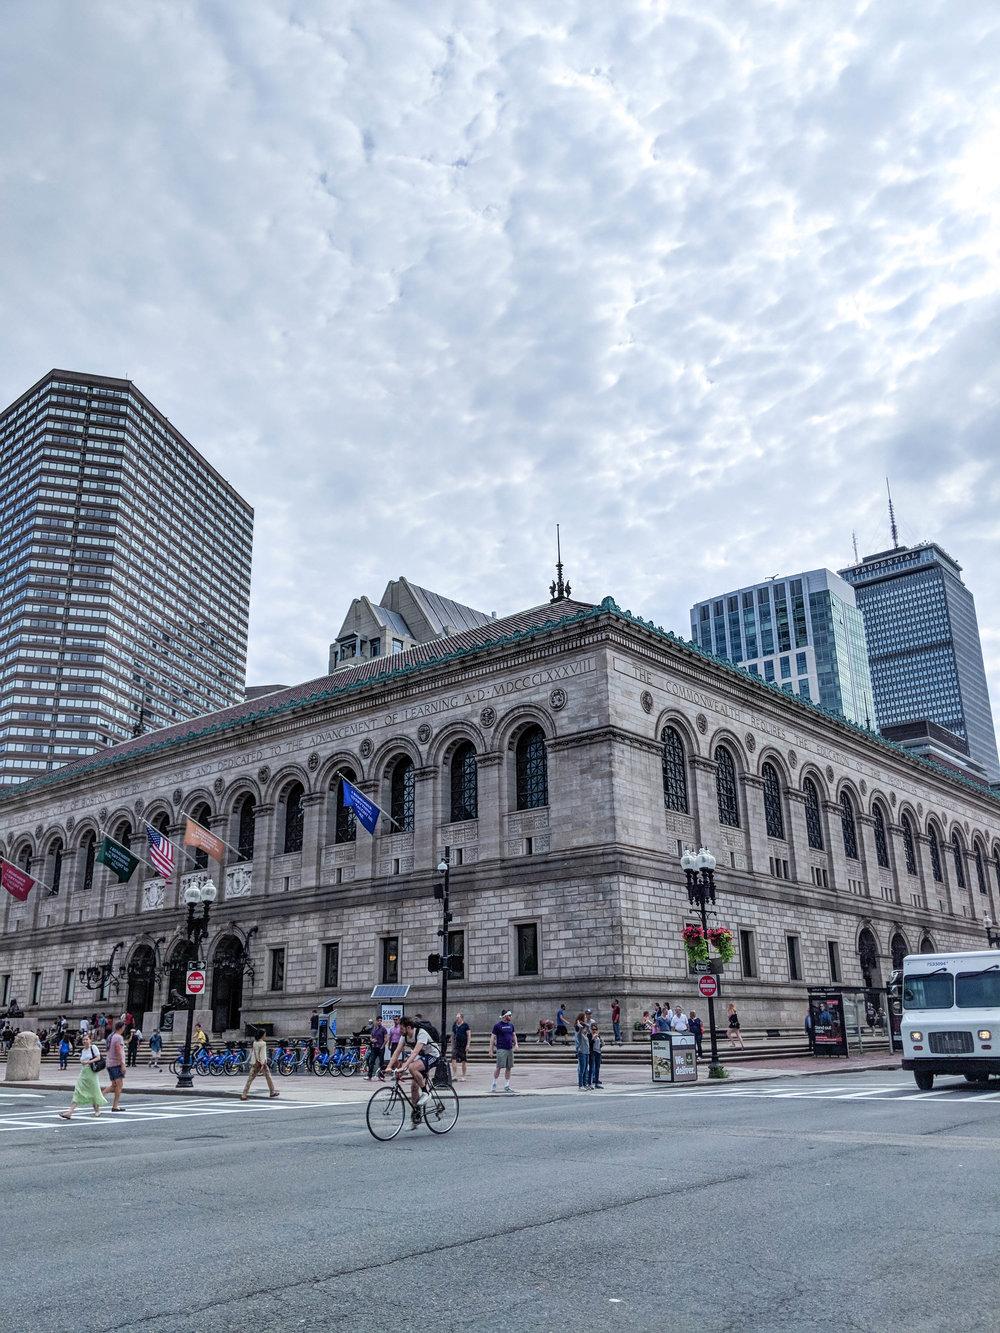 bri rinehart; photography; boston public library